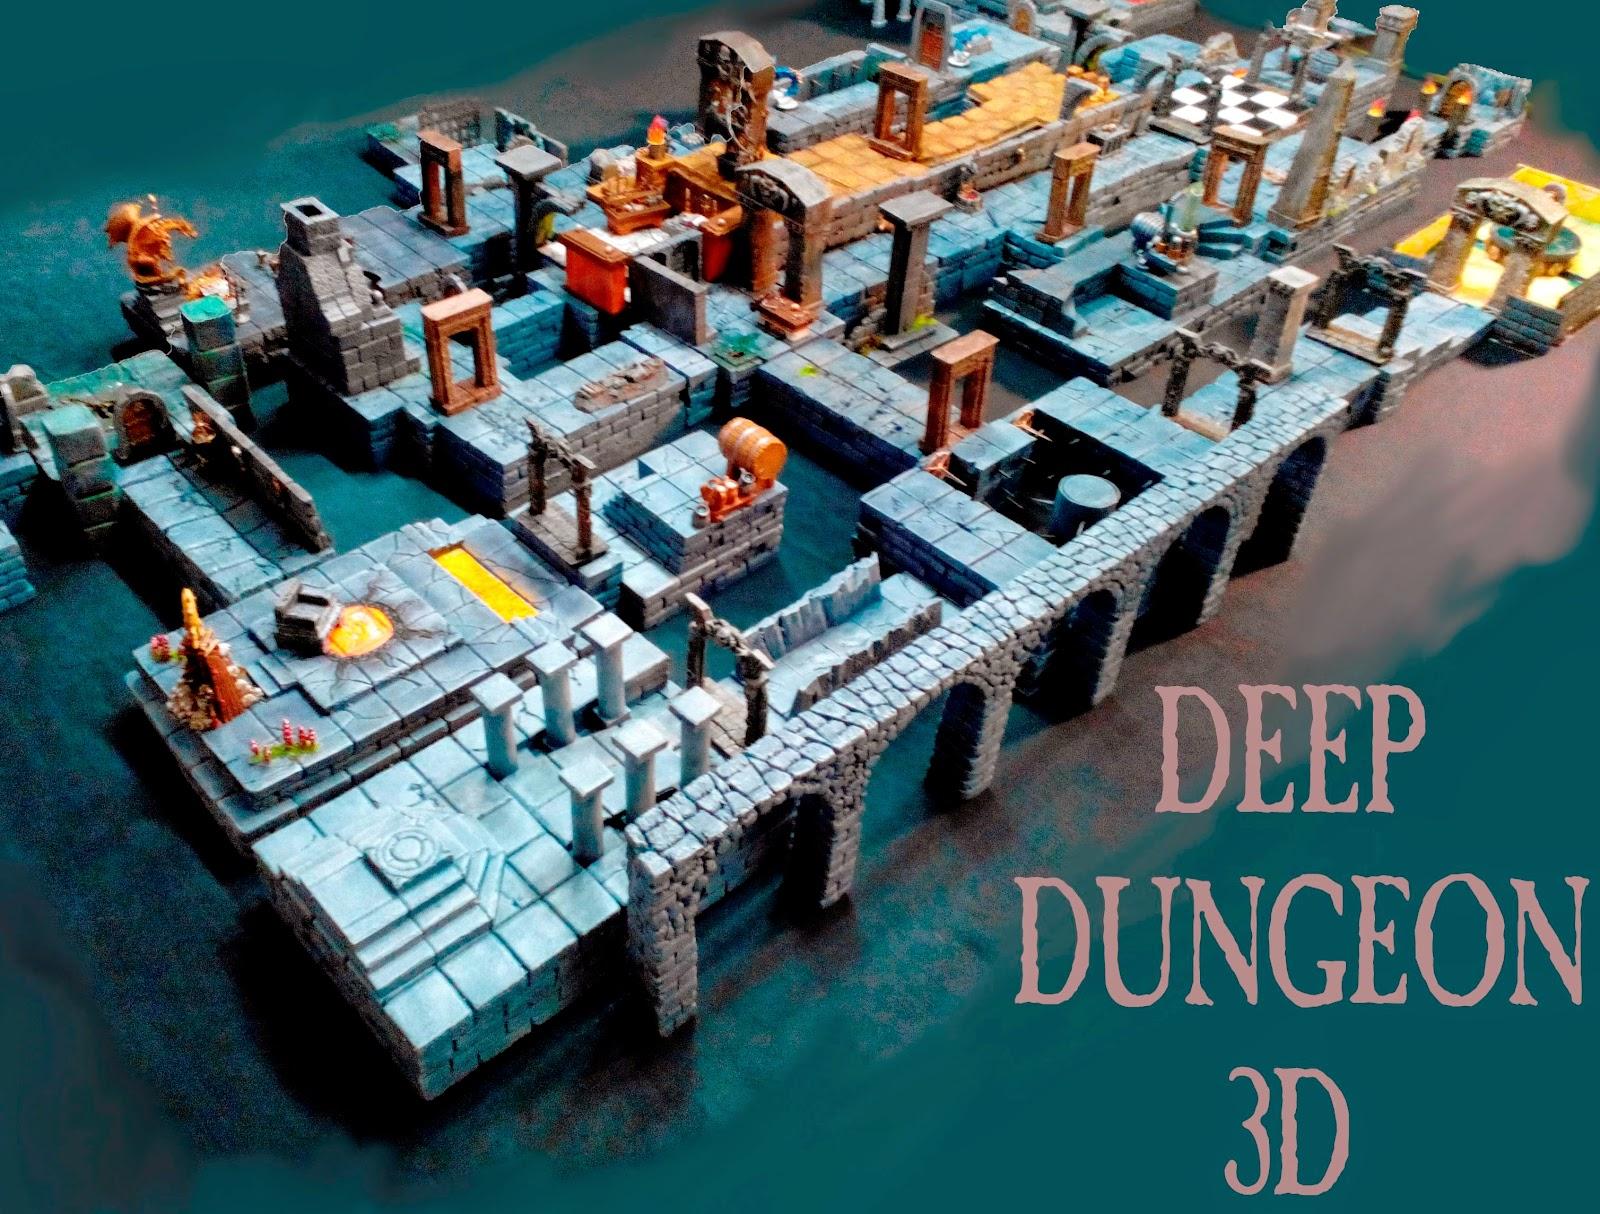 Deep Dungeons lanza su Crowfunding